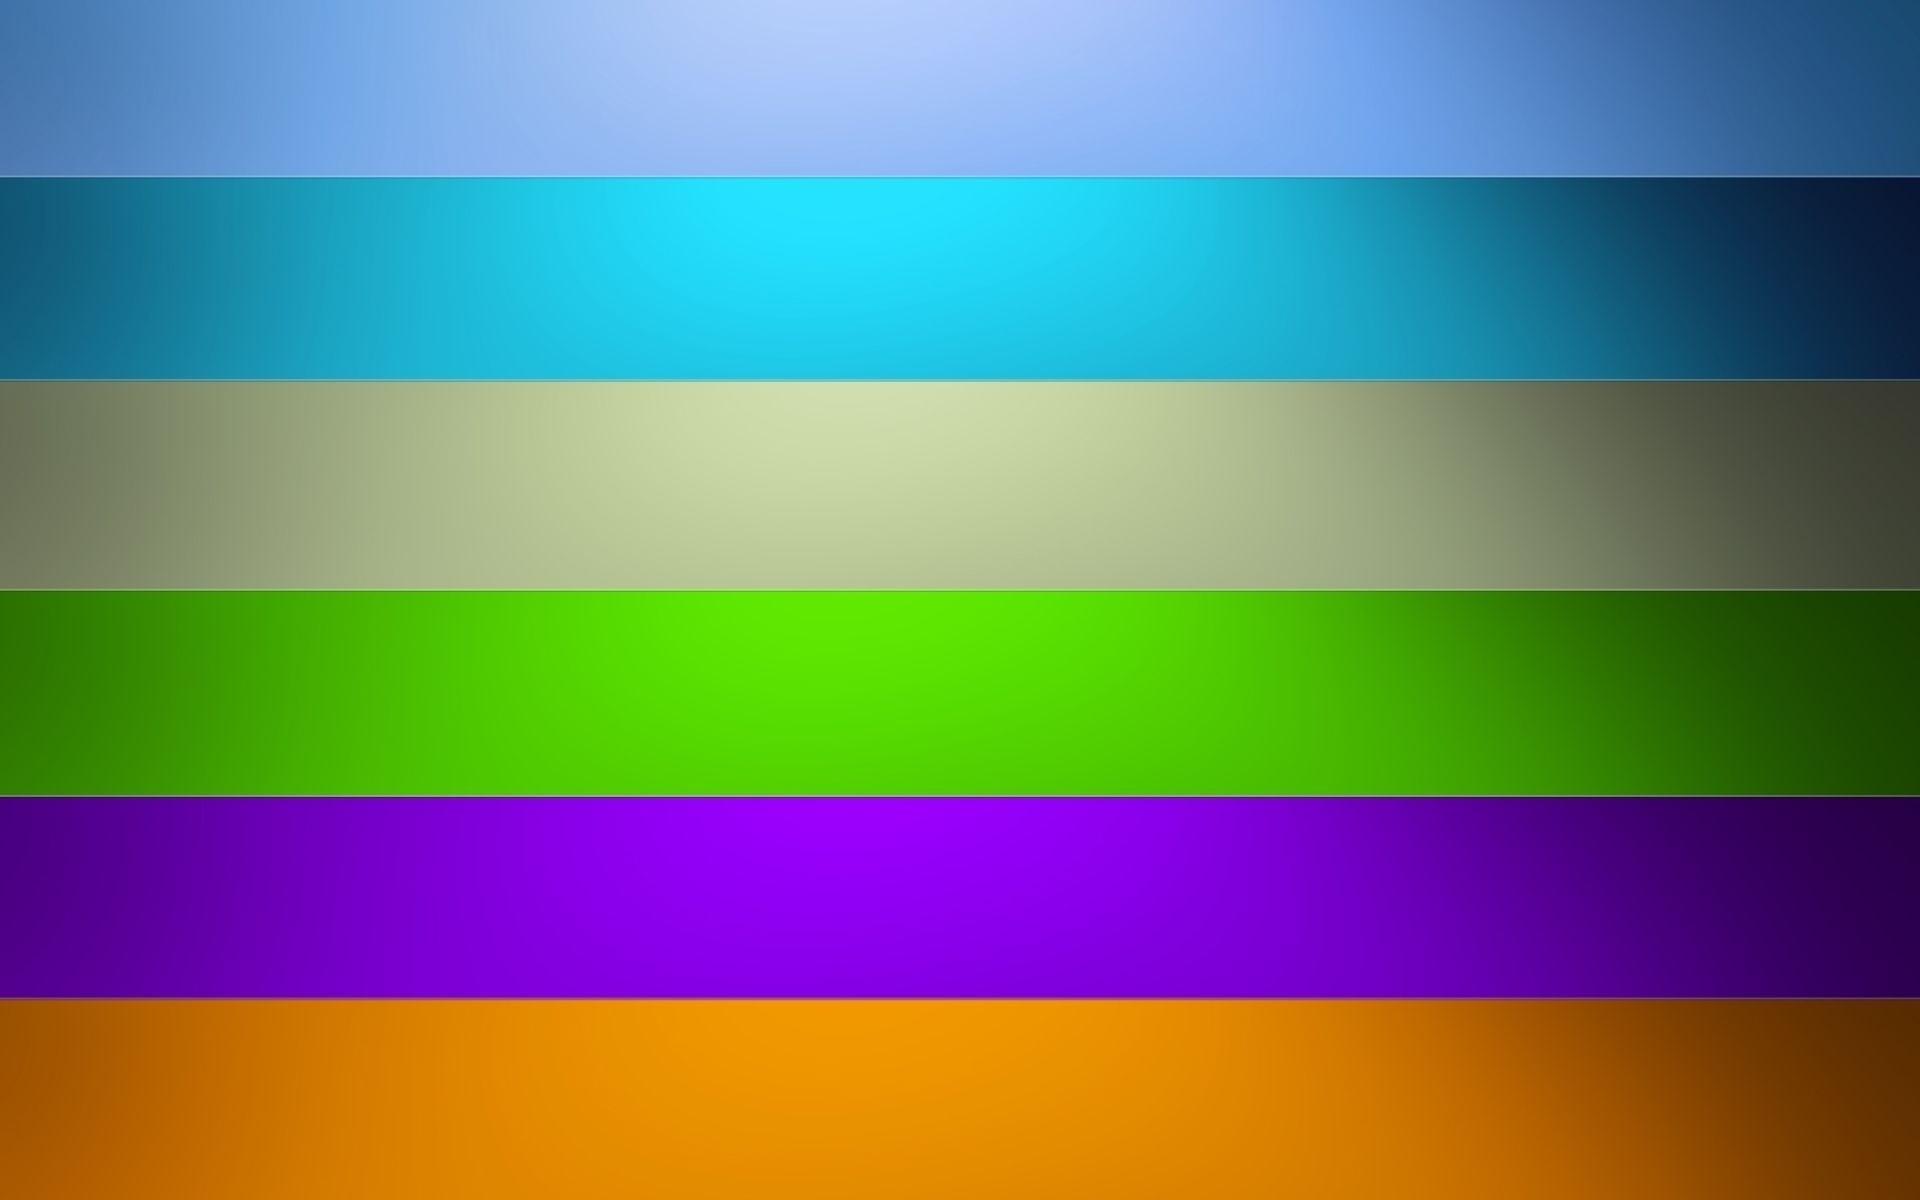 Lines stripes horizontal f wallpaper 1920x1200 163201 1920x1200